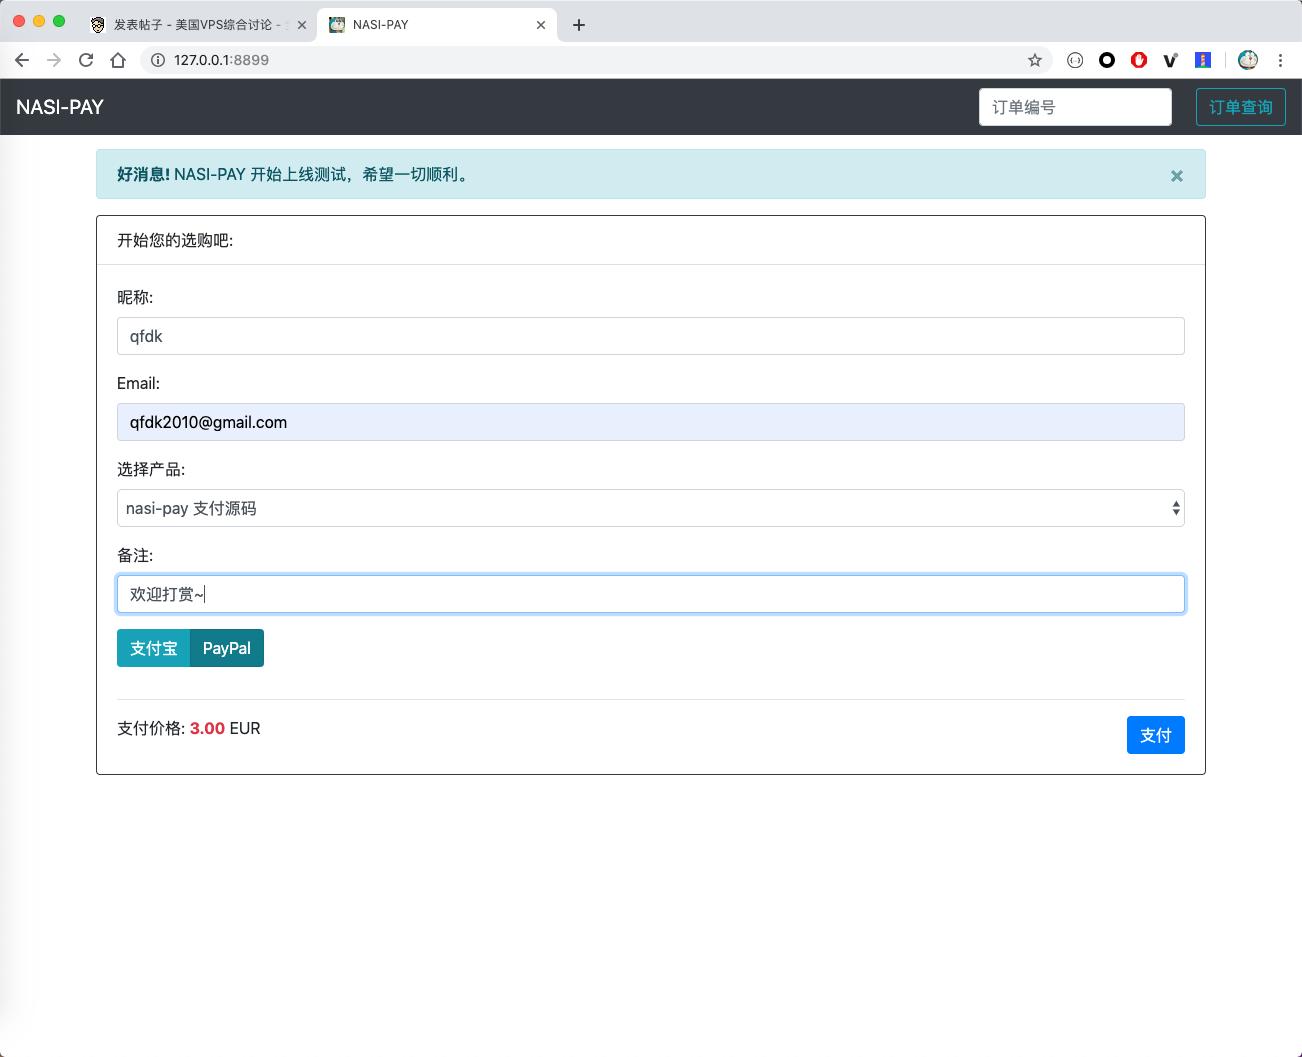 【Spring Boot 广告】发货&打赏源码上线测试喽,支持PayPal